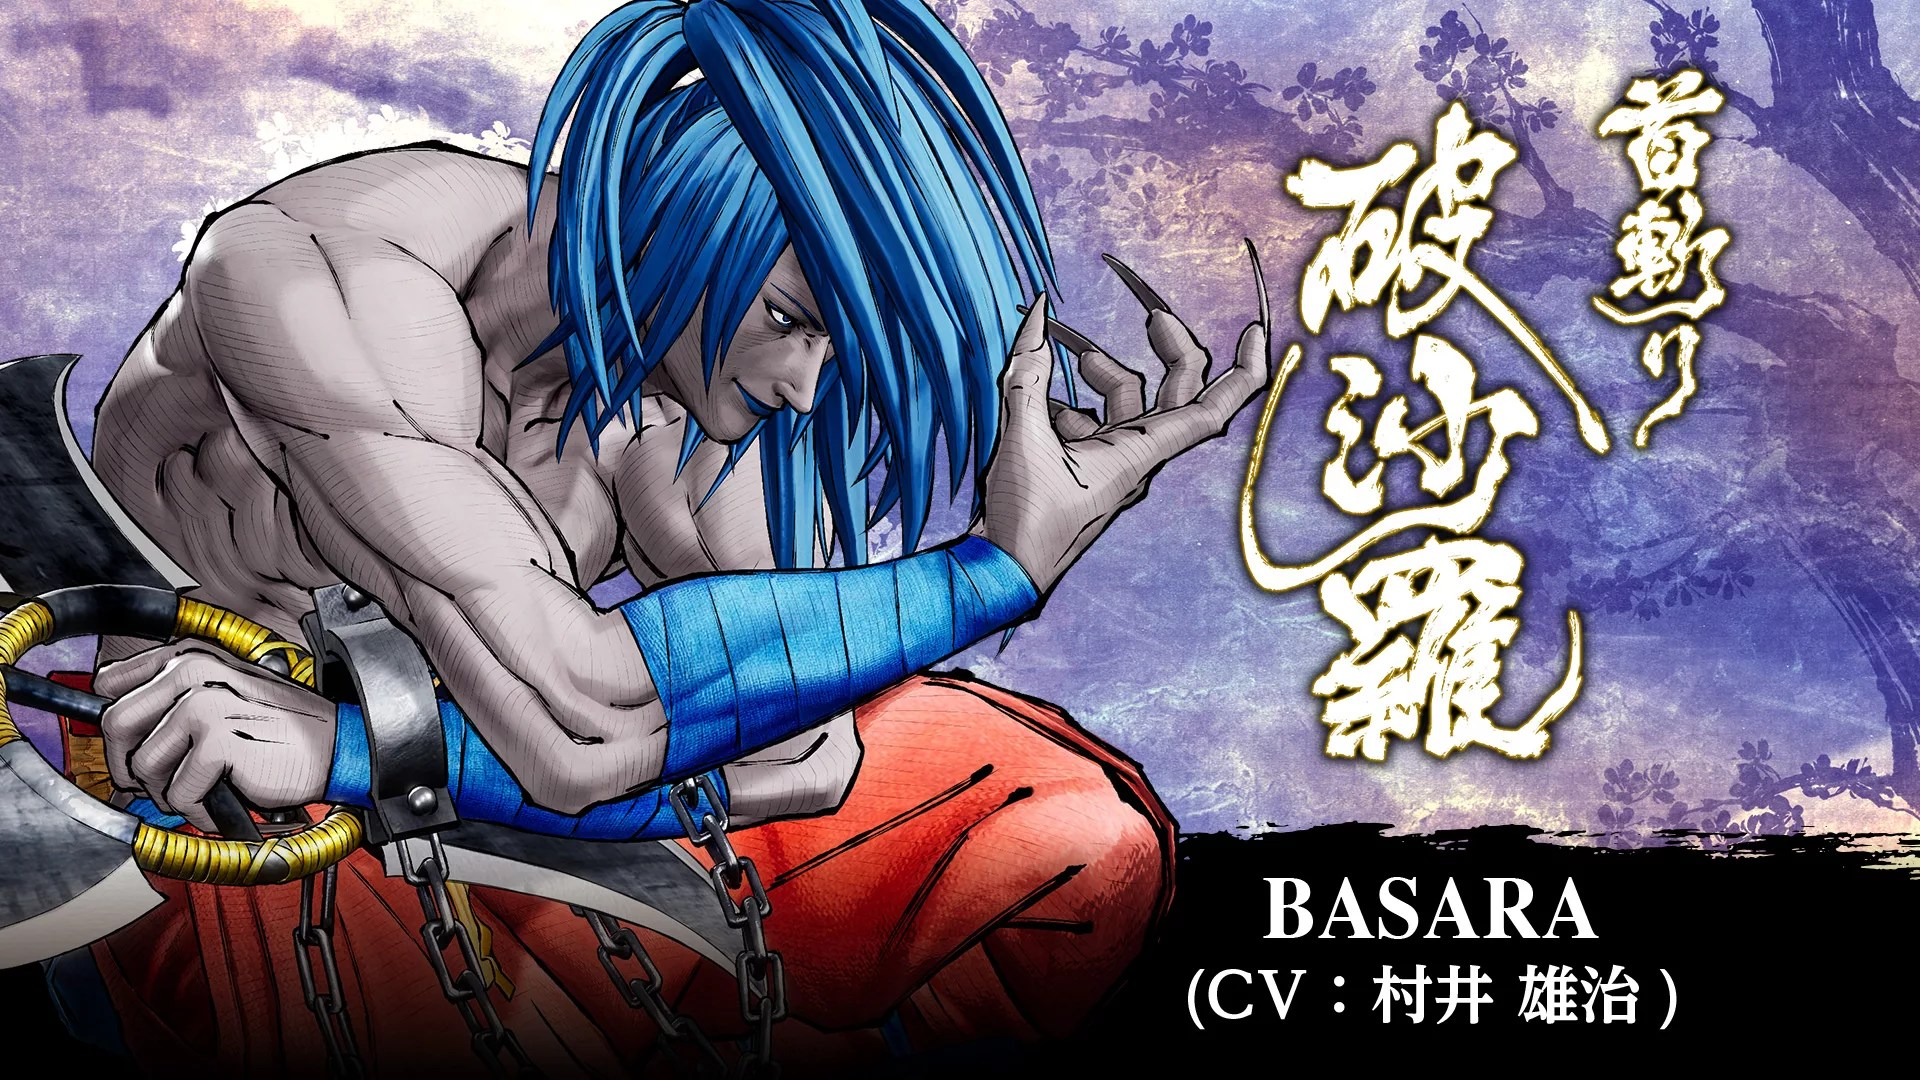 SAMURAI SPIRITS追加DLCキャラクター「首斬り破沙羅」の配信日が決定!!